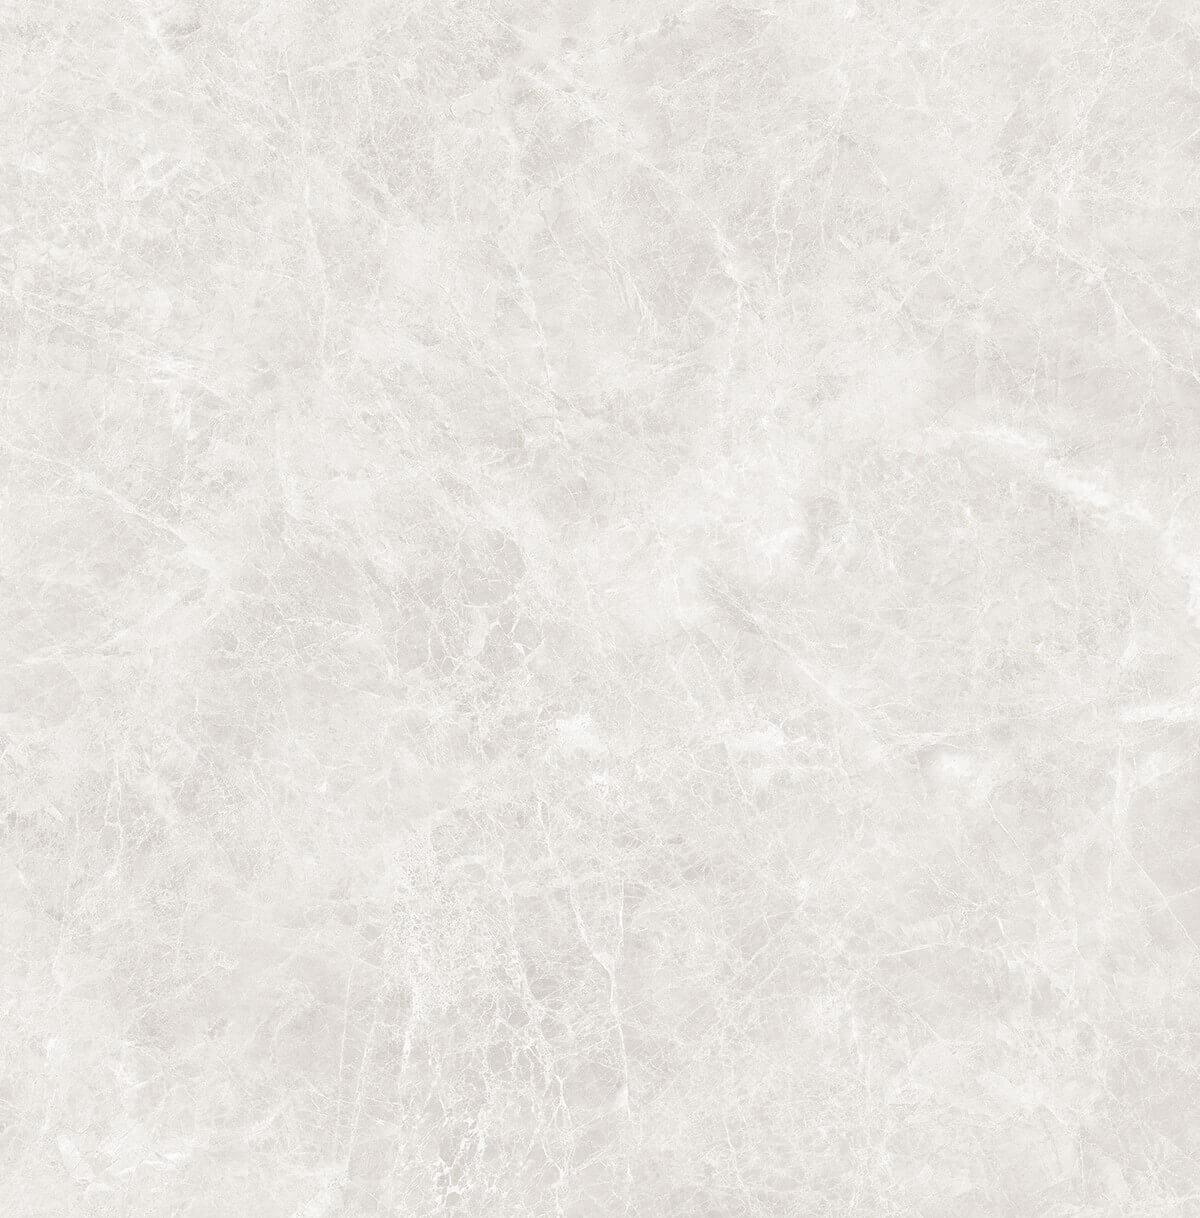 Orlando Bianco Polished Rectified Porcelain Floor Tile 6706